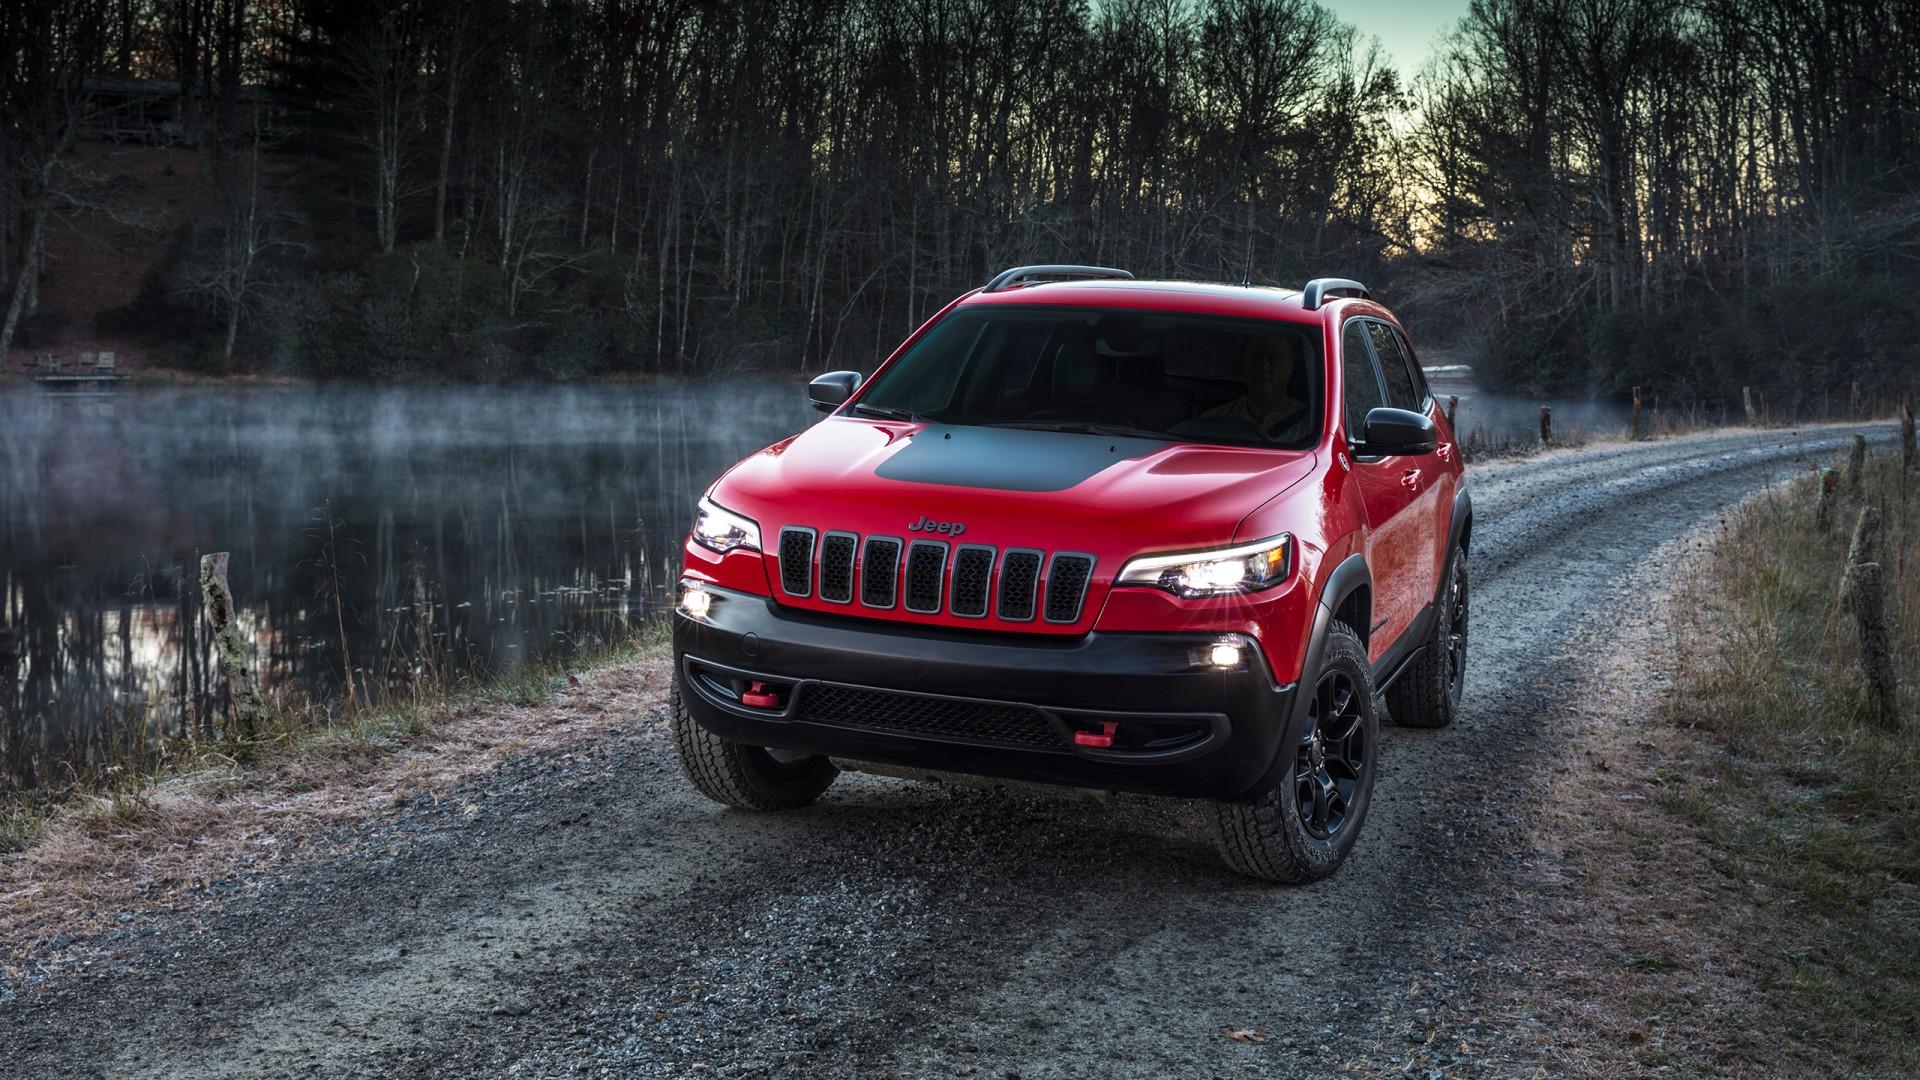 2019 Jeep Cherokee Trailhawk Wallpaper   HD Car Wallpapers ...